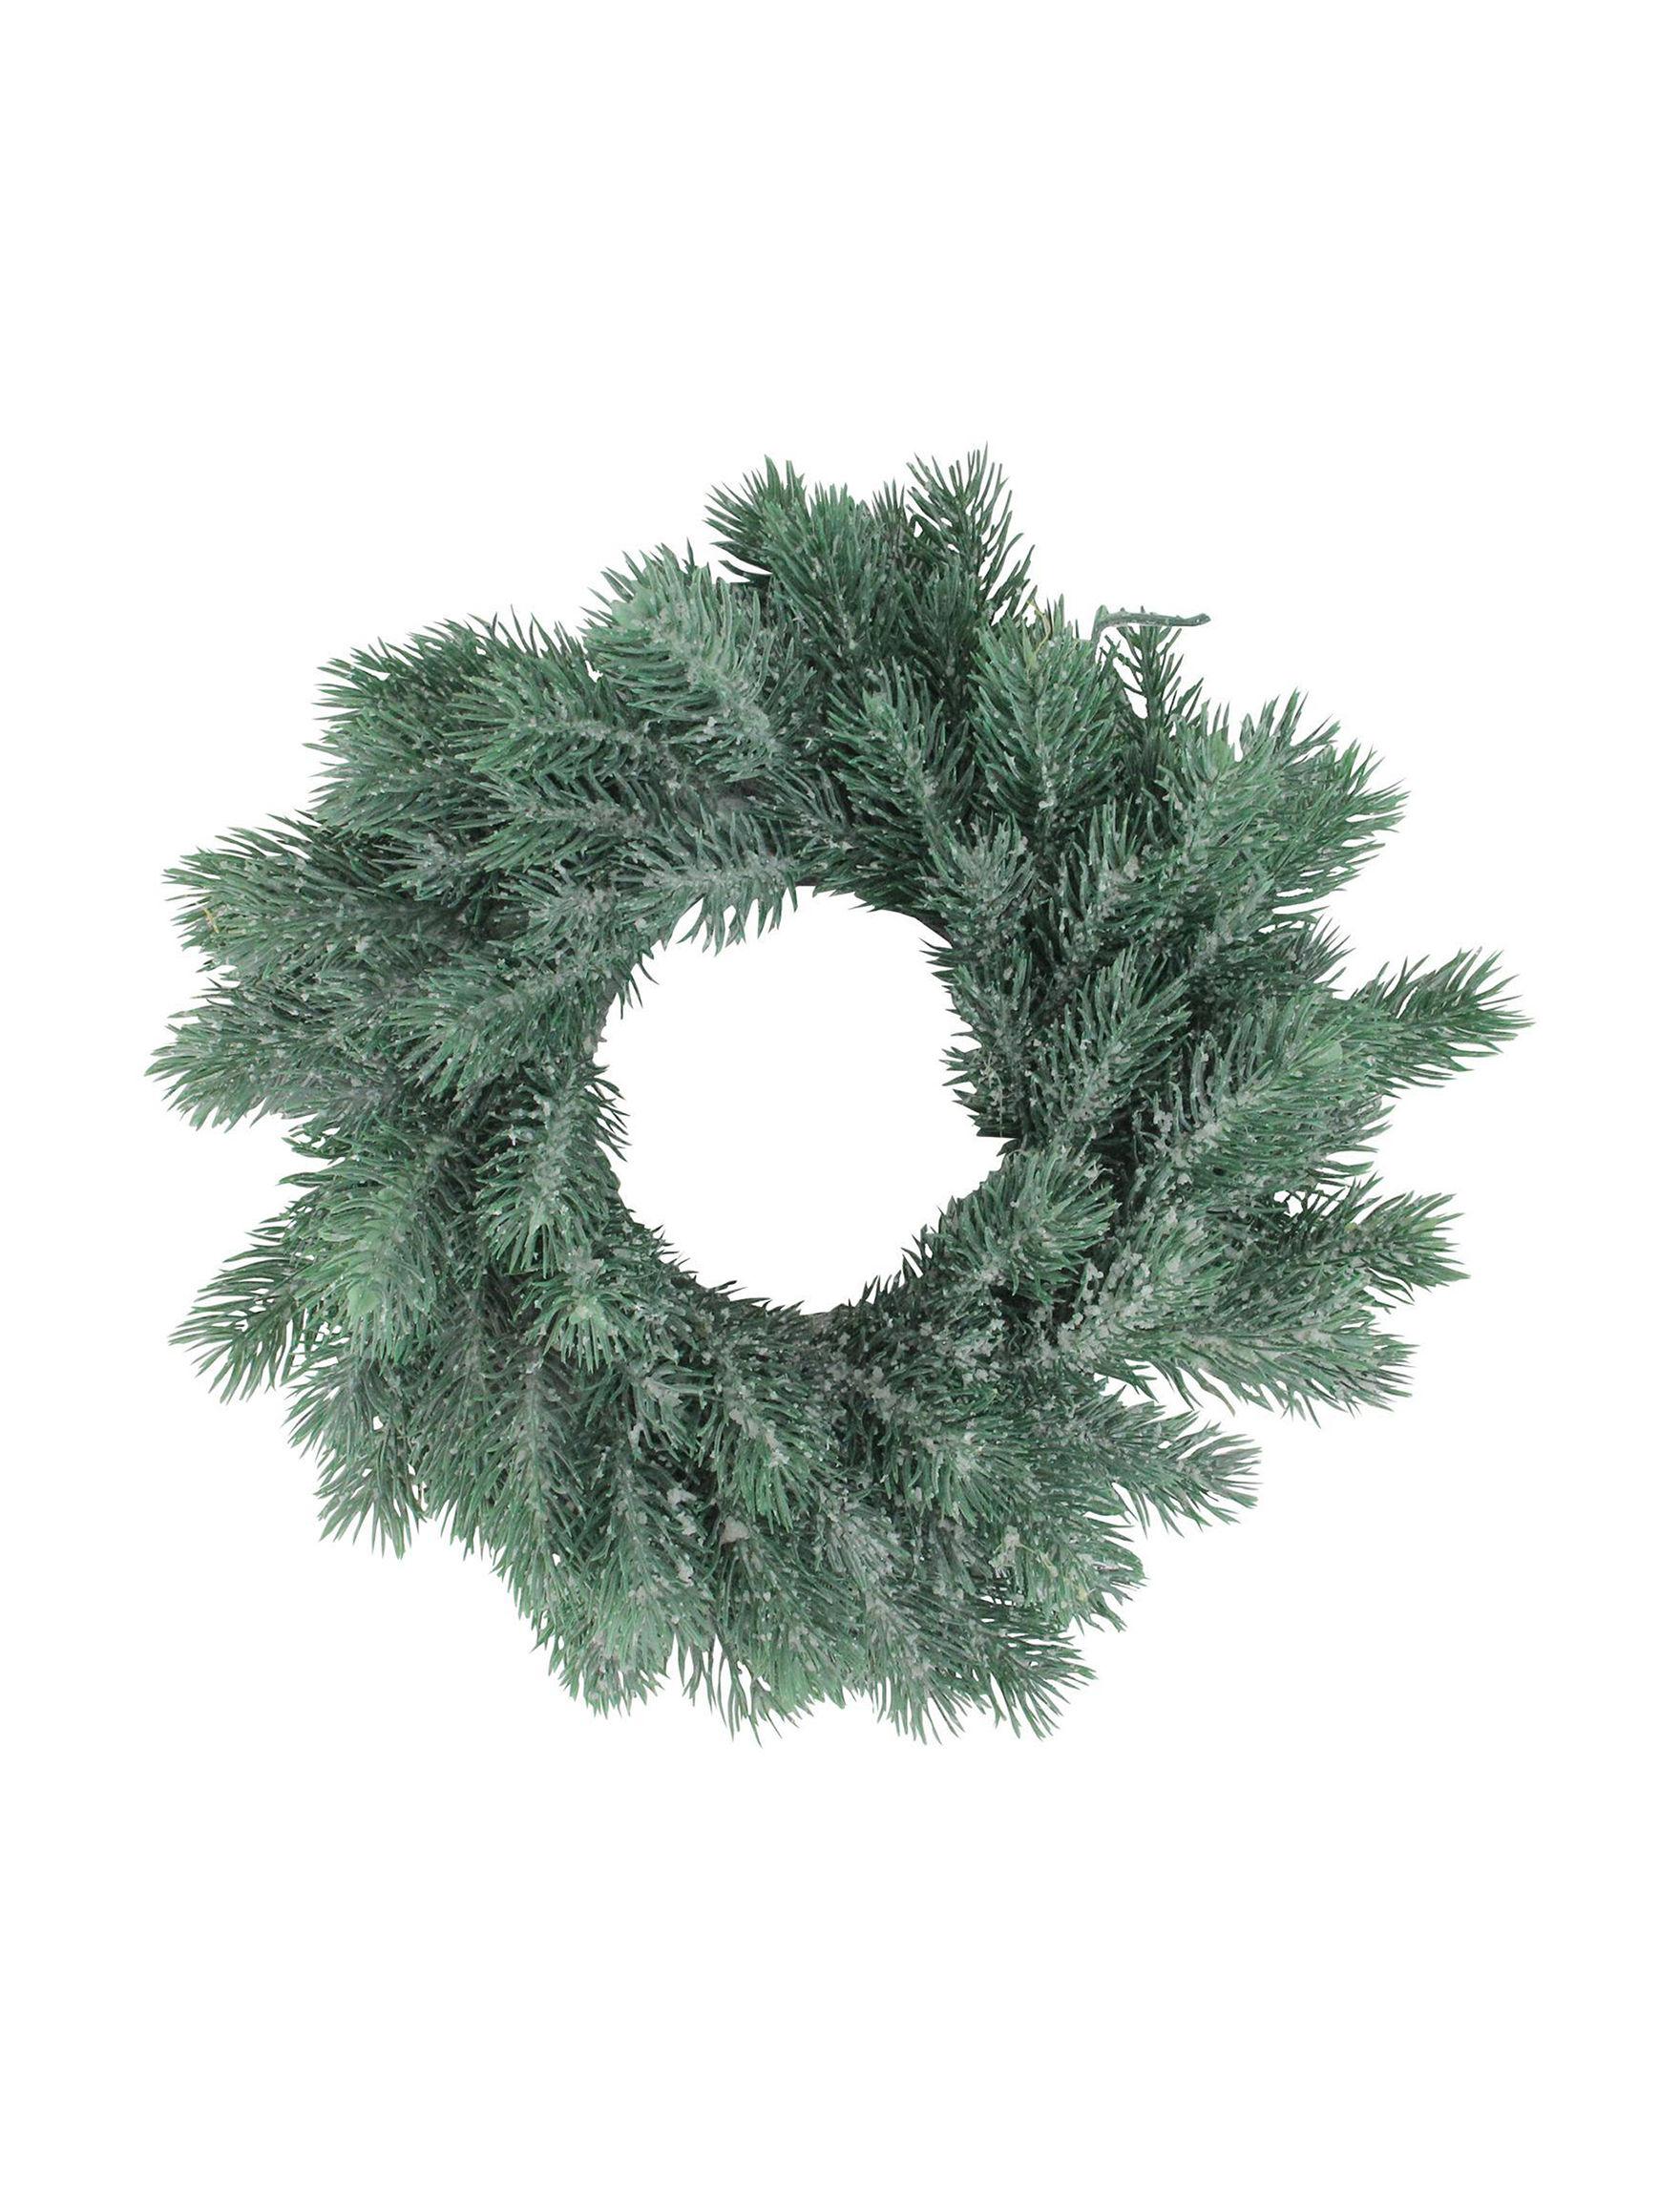 Northlight Green Wreaths & Garland Holiday Decor